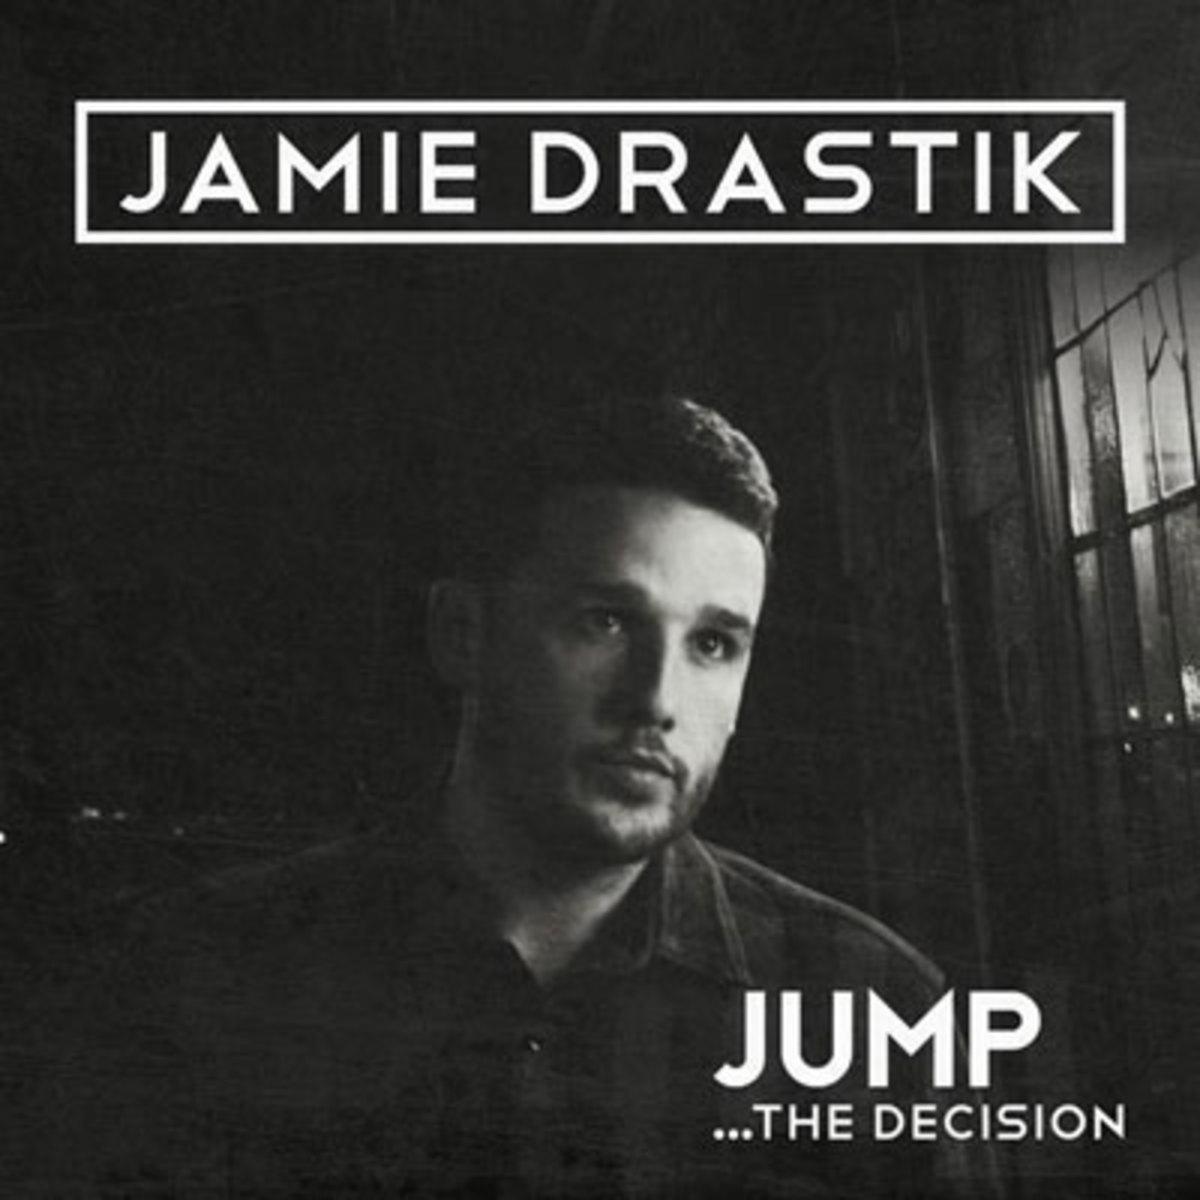 jamiedrastik-jump.jpg